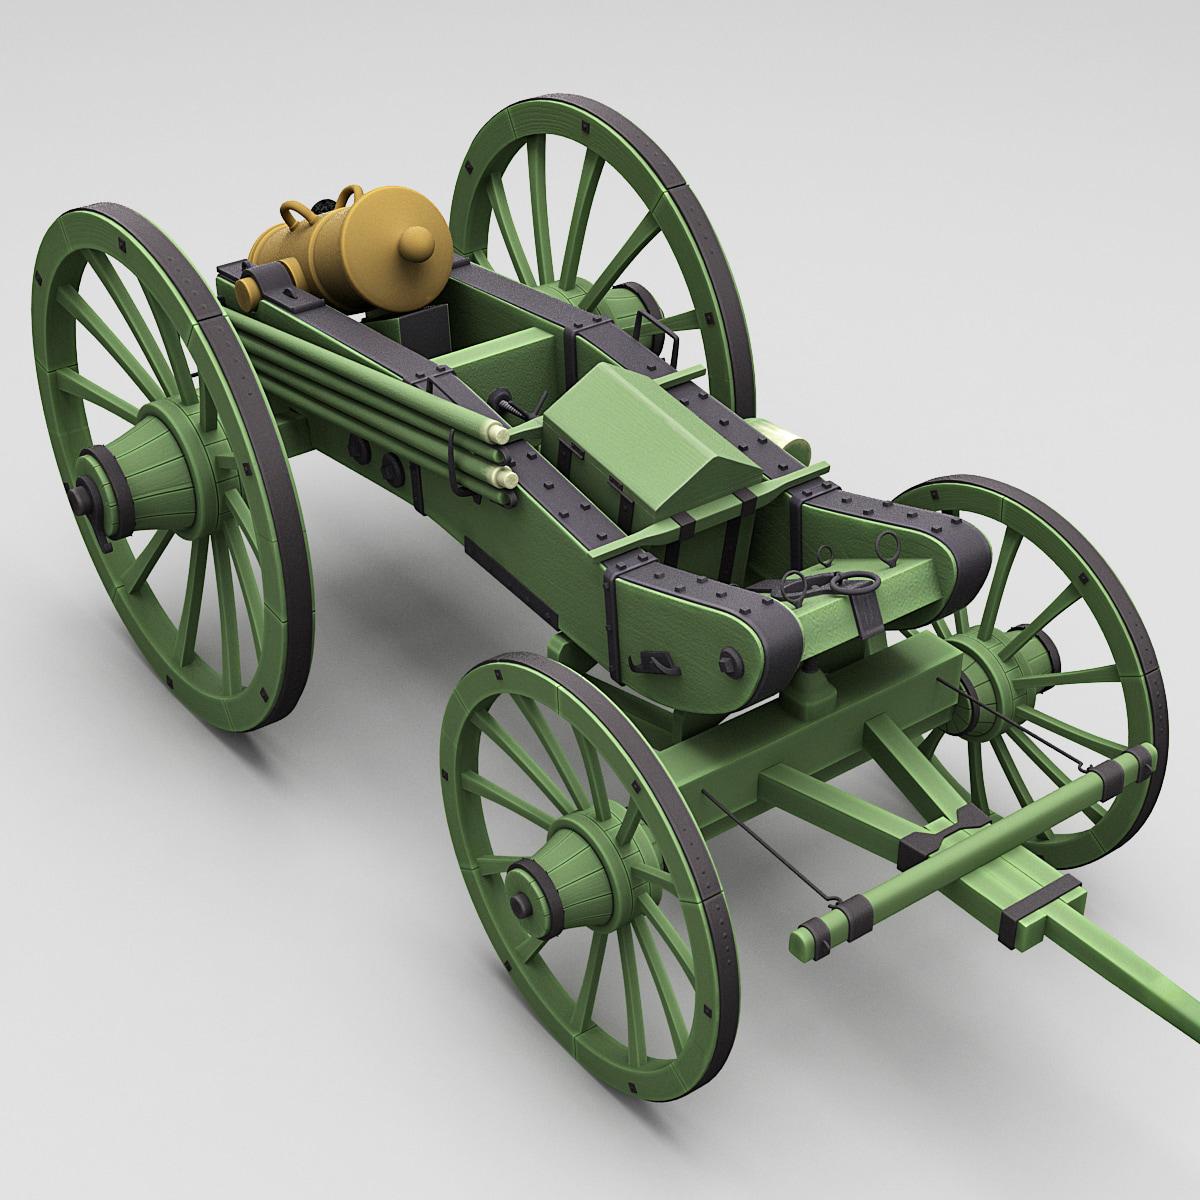 Napoleons_6-inch_Gribeauval_howitzer_Transport_Position_V2_0000.jpg